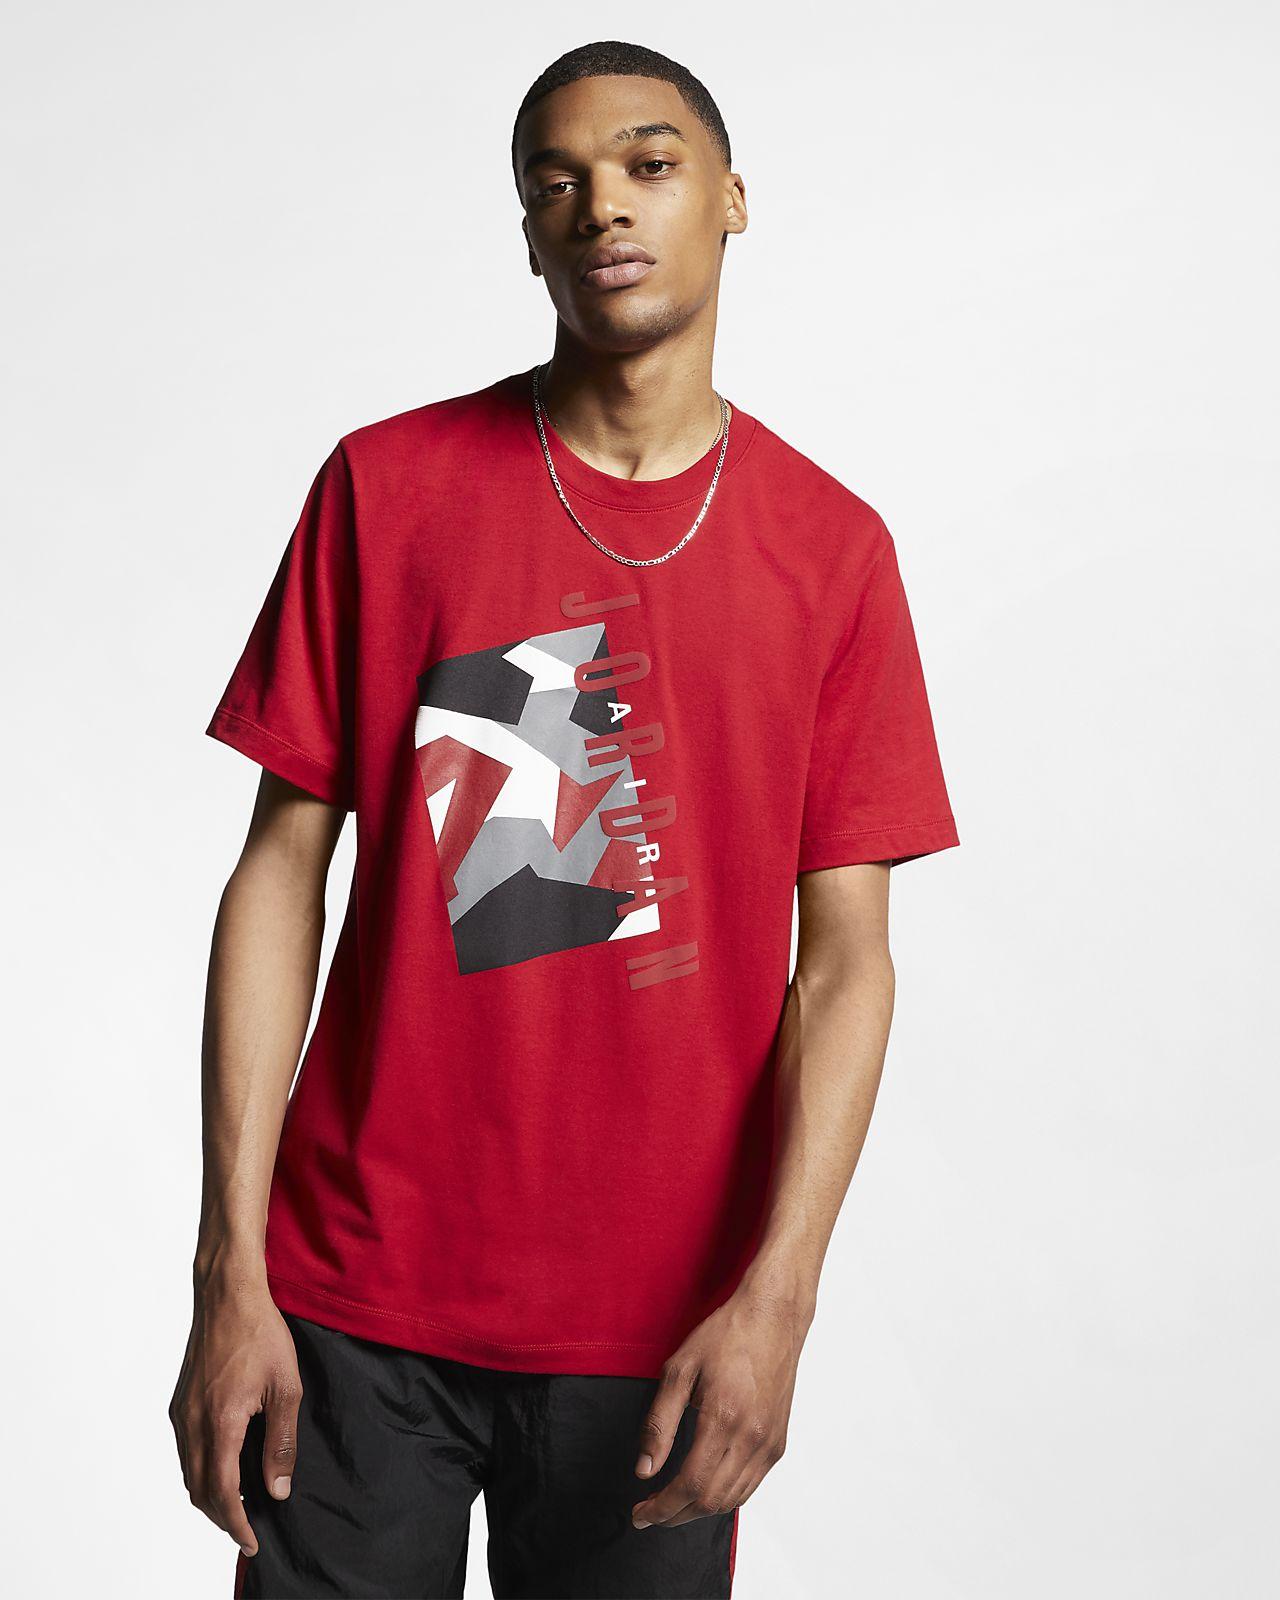 Jordan Pattern Men's T-Shirt